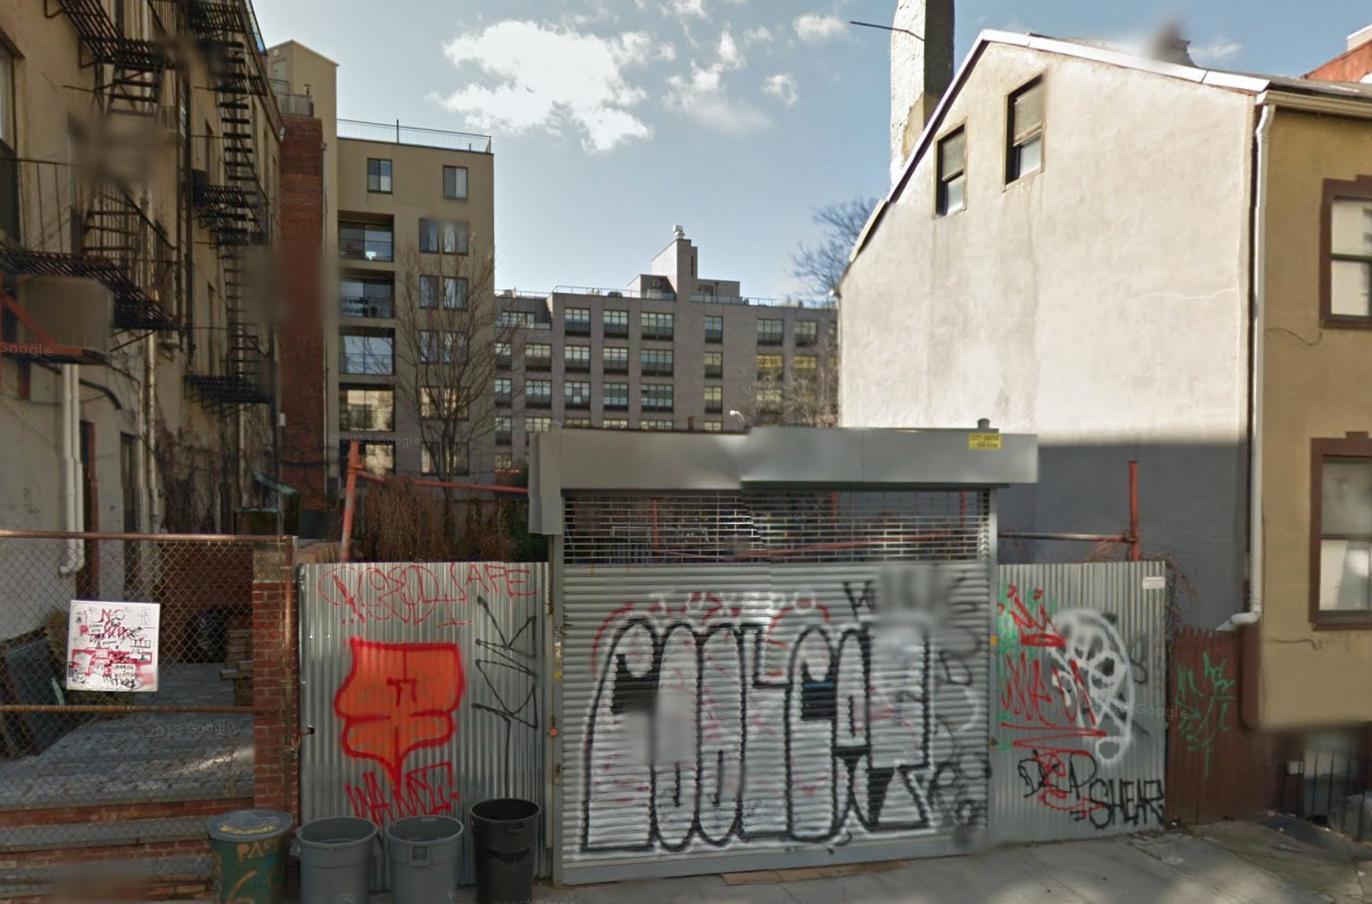 66 North 3rd Street